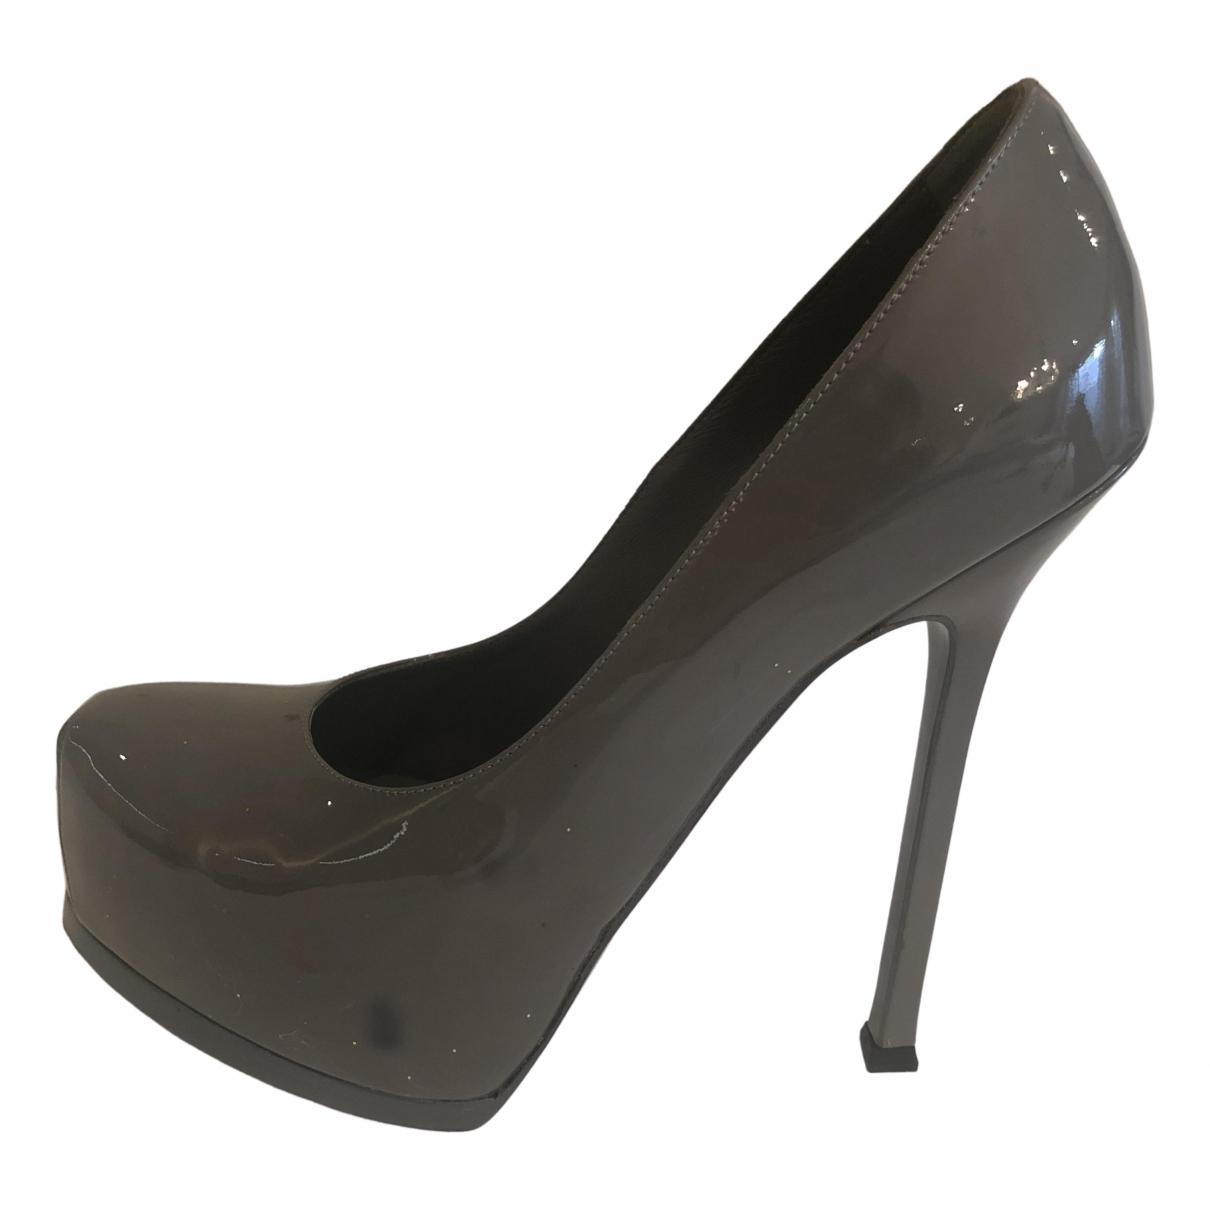 Yves Saint Laurent Trib Too Grey Patent leather Heels for Women 38.5 EU